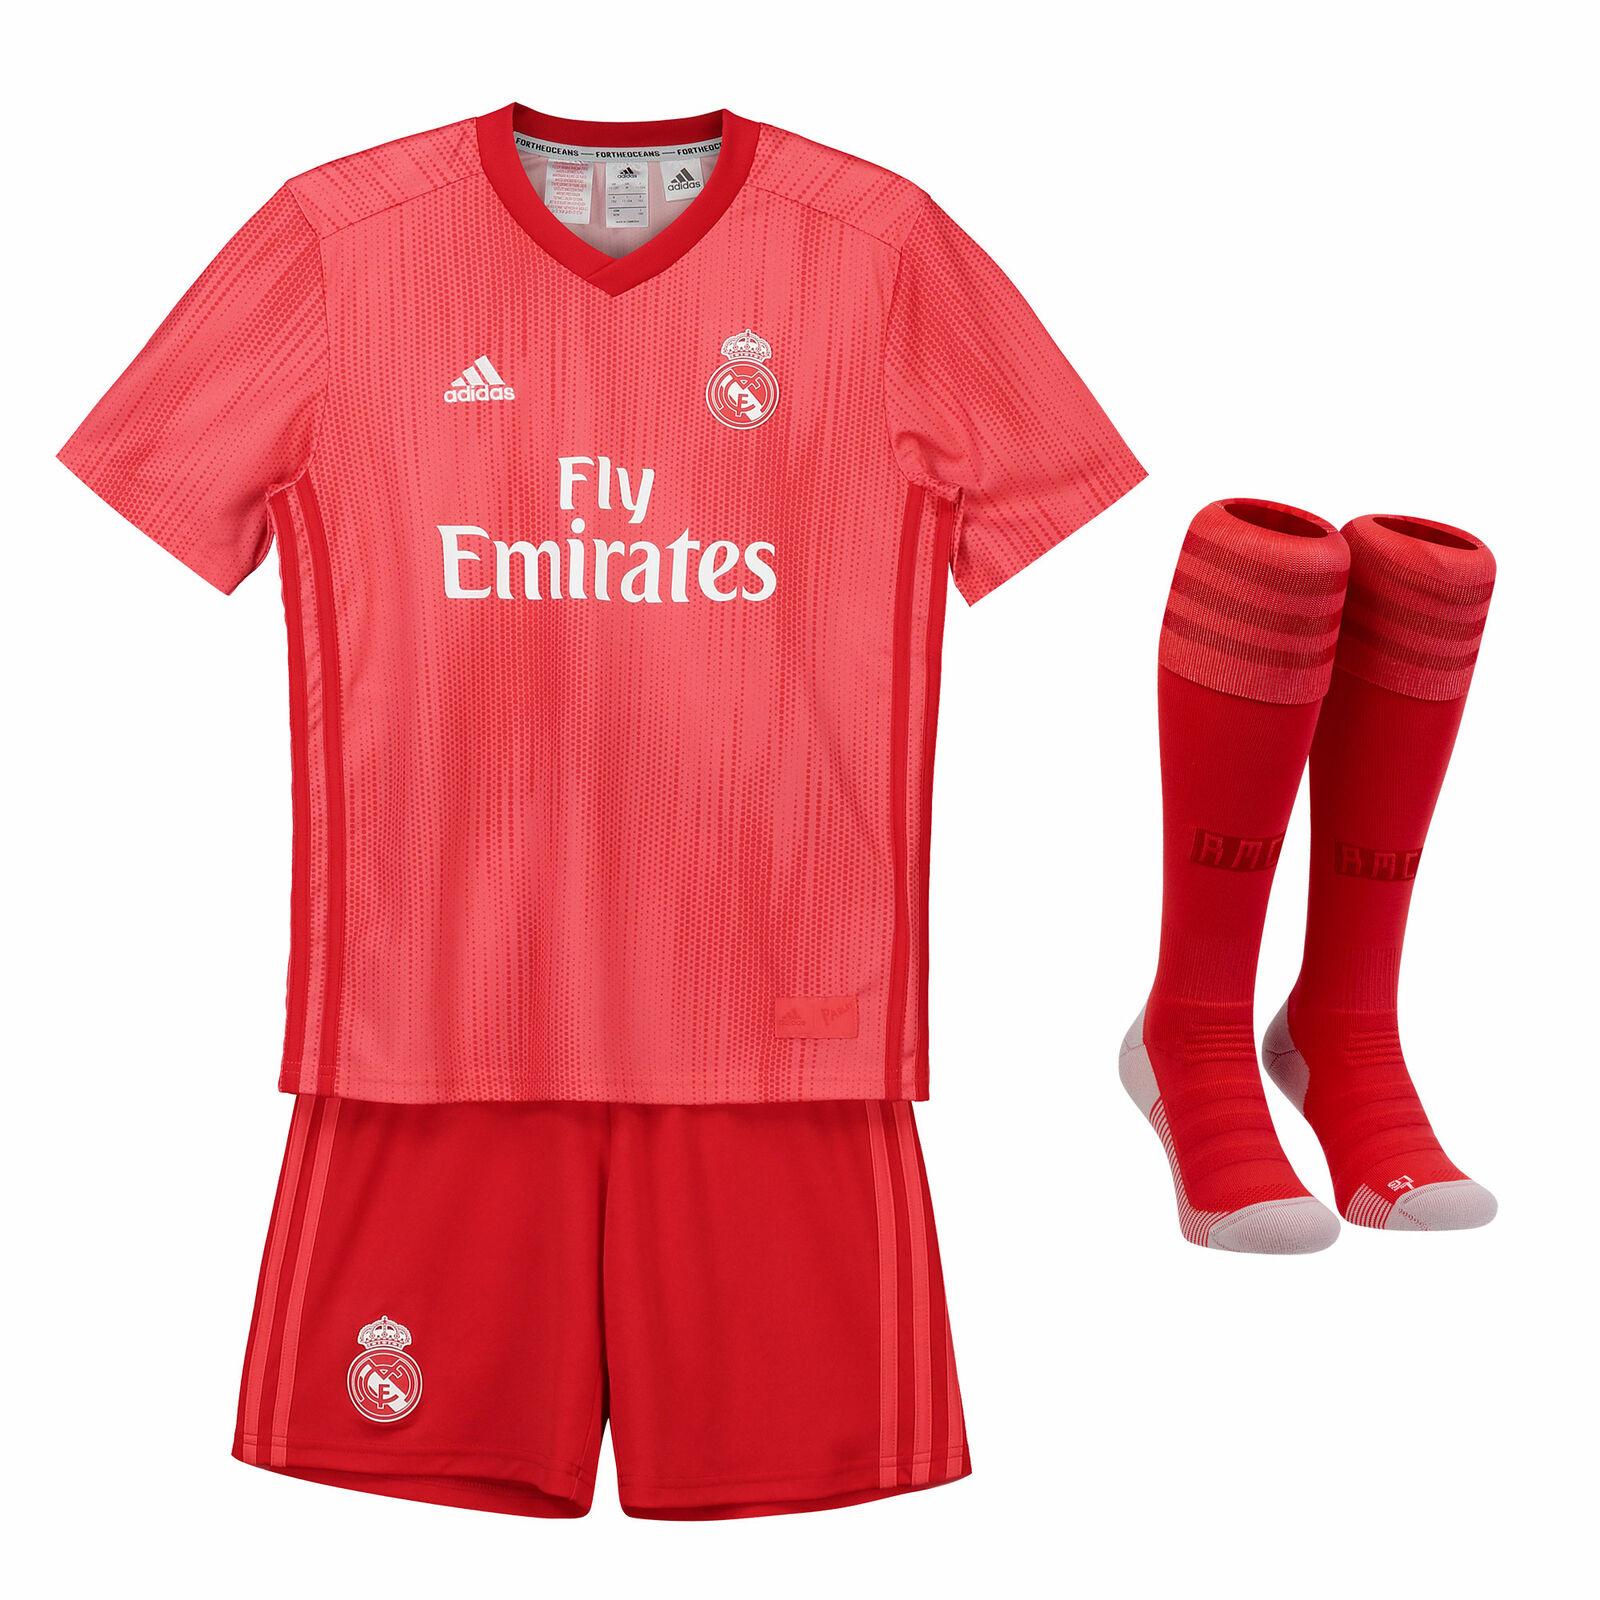 Offiziell Real Madrid Third Kinder Kinder Kinder Mini Kit Fußball Trikot Shorts 2018 19 adidas d286be